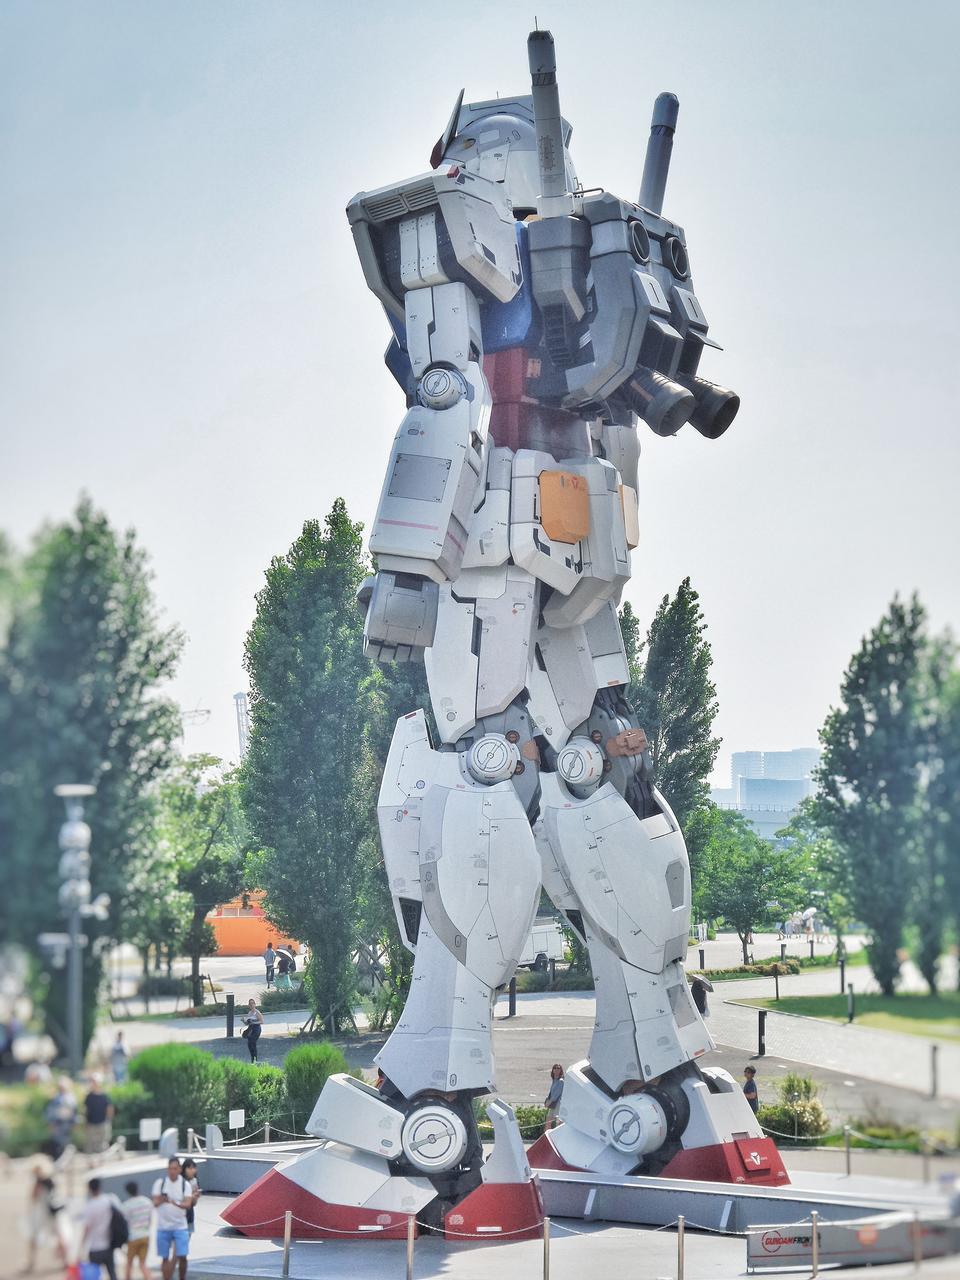 Statue of Gundam at DivercCity Tokyo Plaza in Tokyo